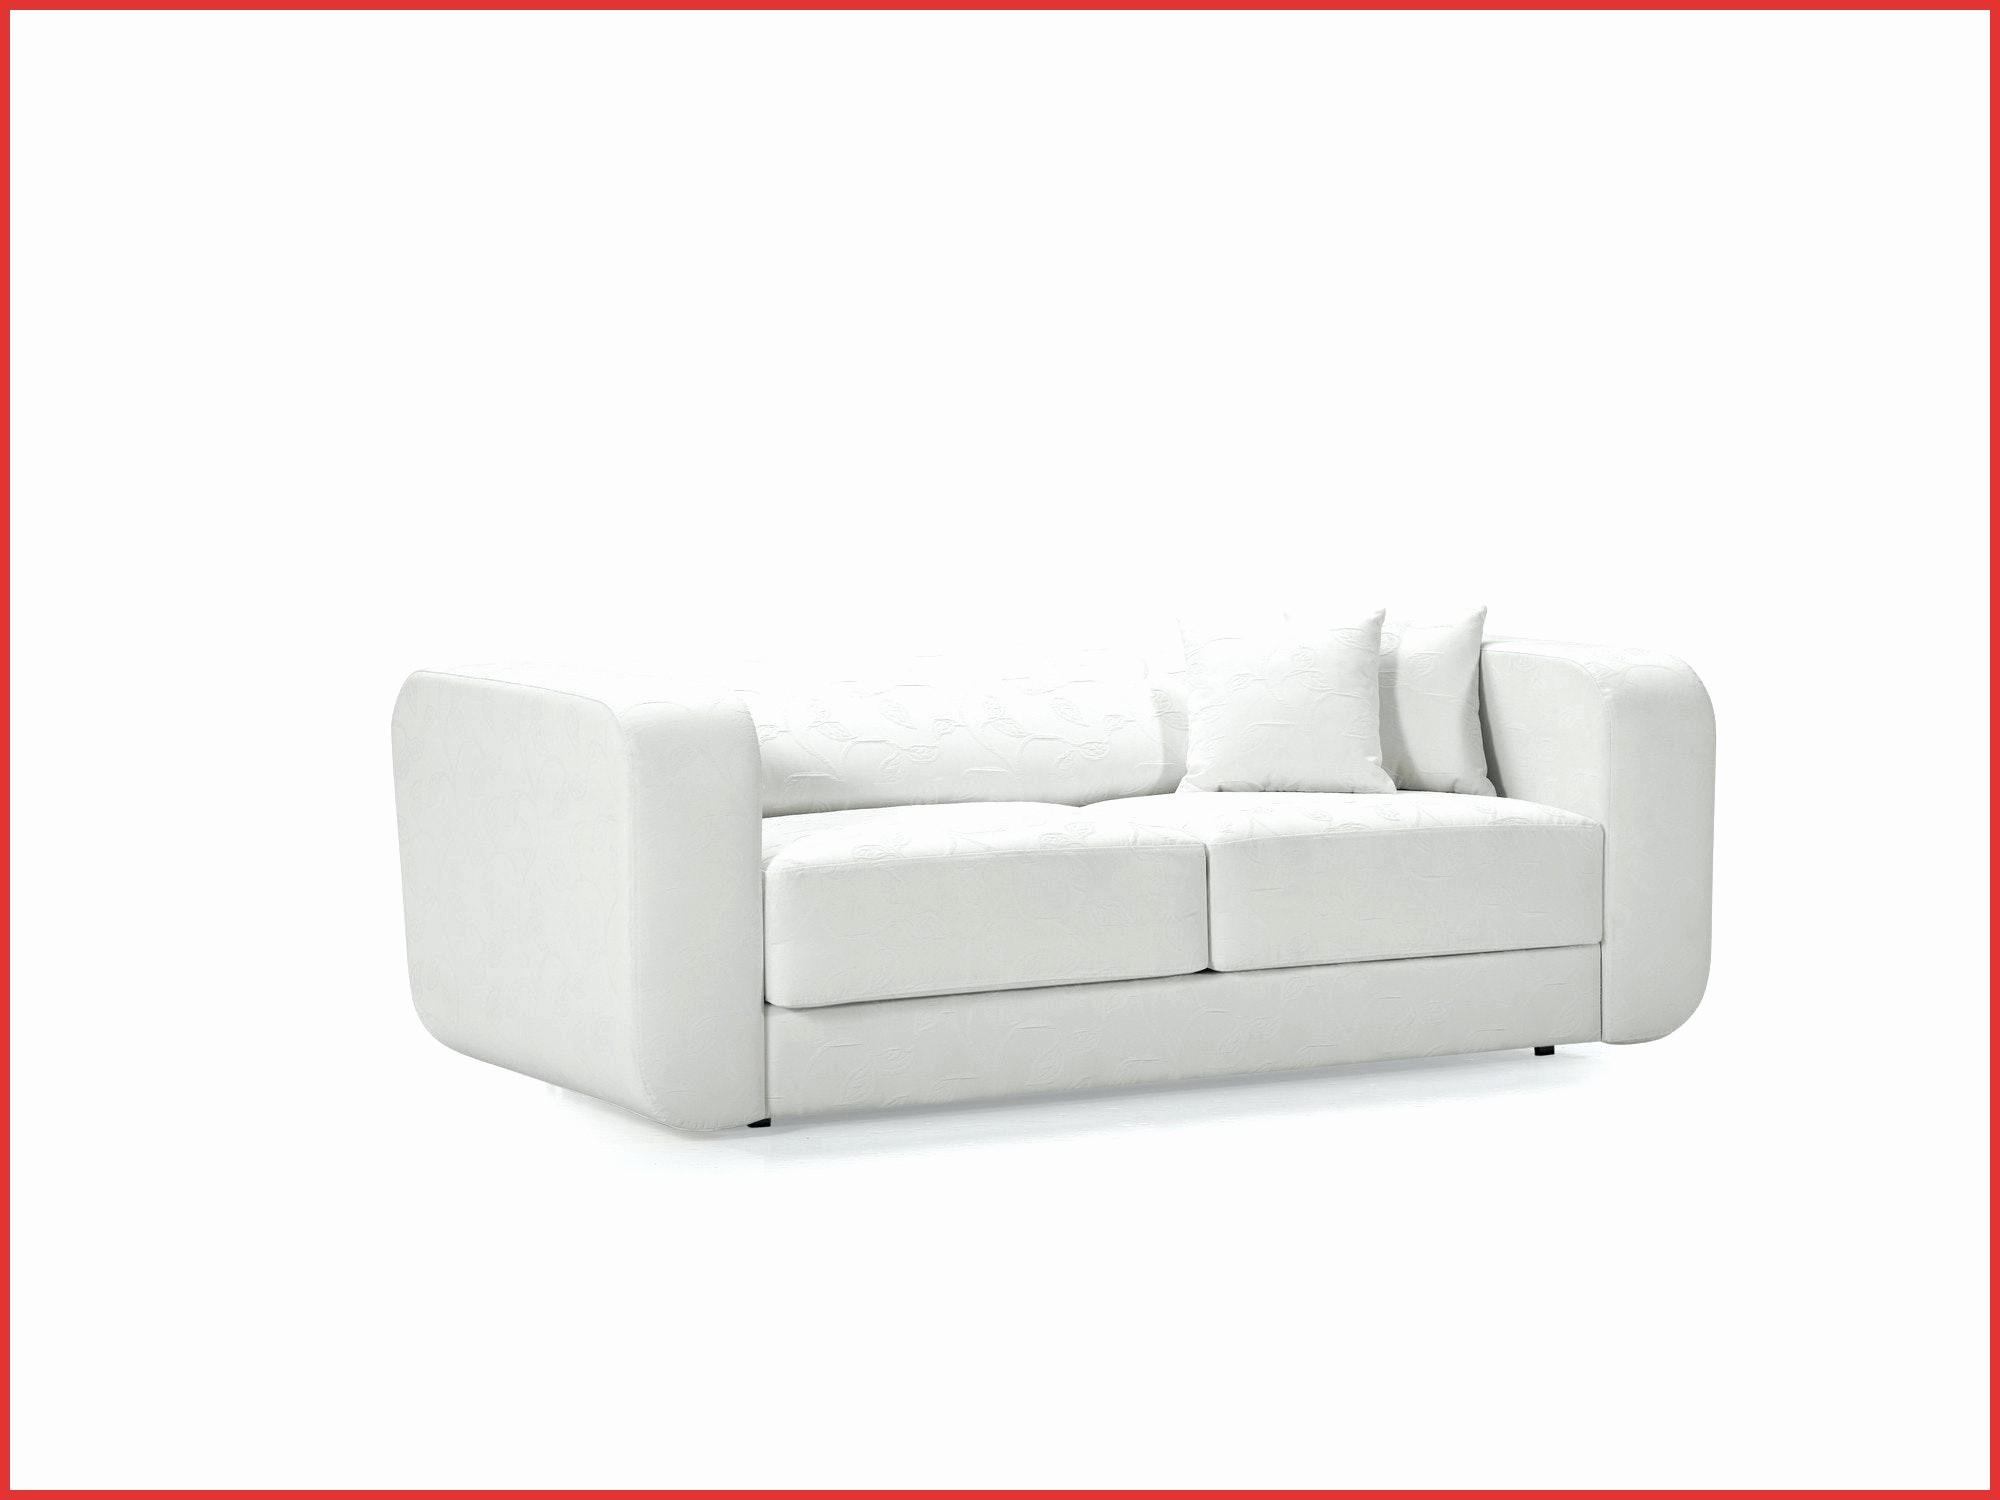 Canape Angle Convertible Ikea Élégant Stock Splendide Lit Canape Ikea Ideas Best Lit Canap Ikea Elegant